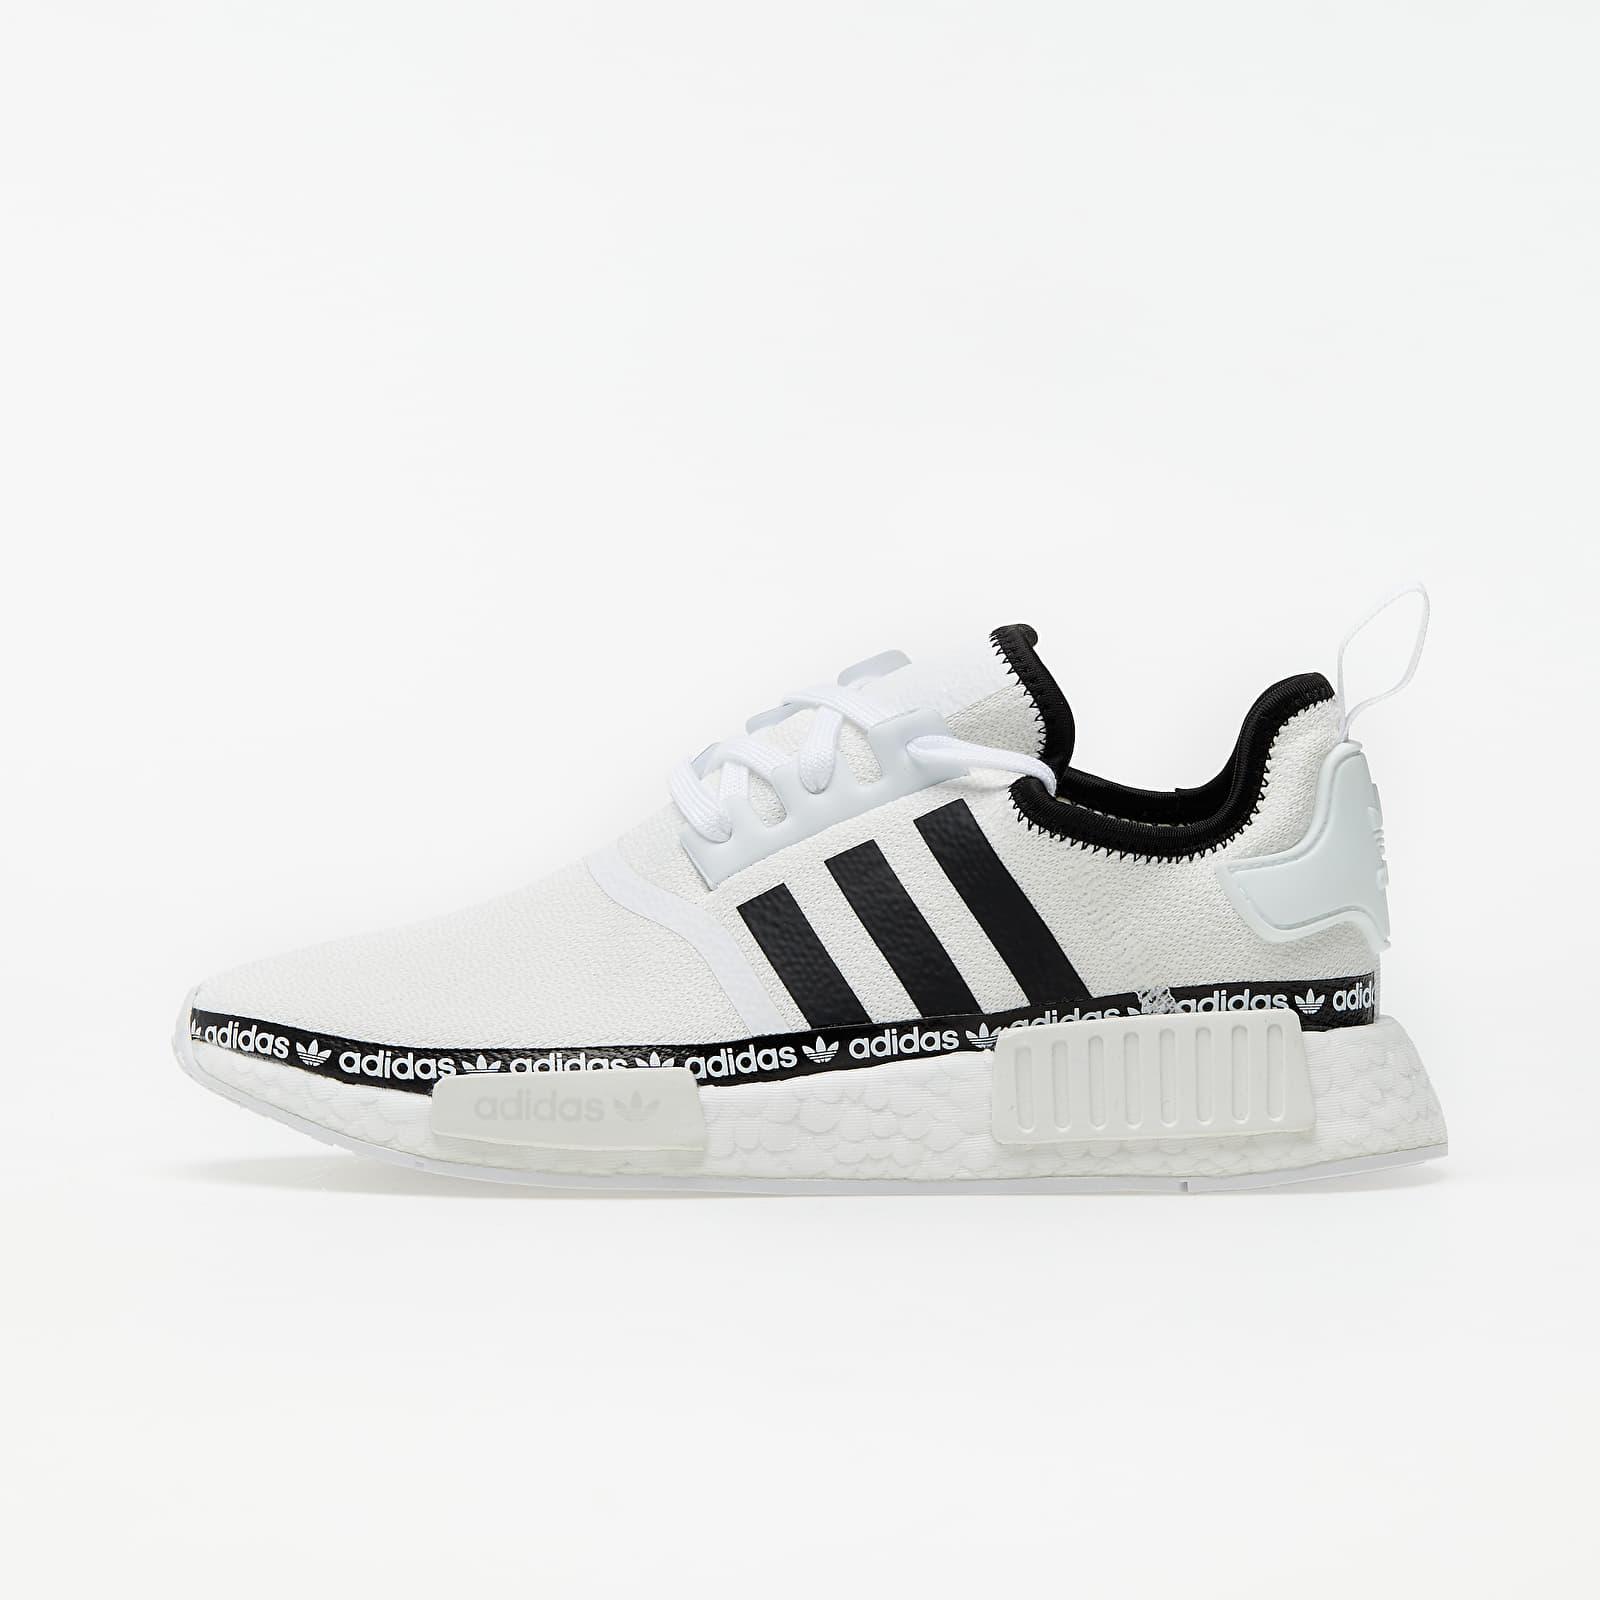 adidas NMD_R1 Ftw White/ Core Black/ Ftw White FV8727